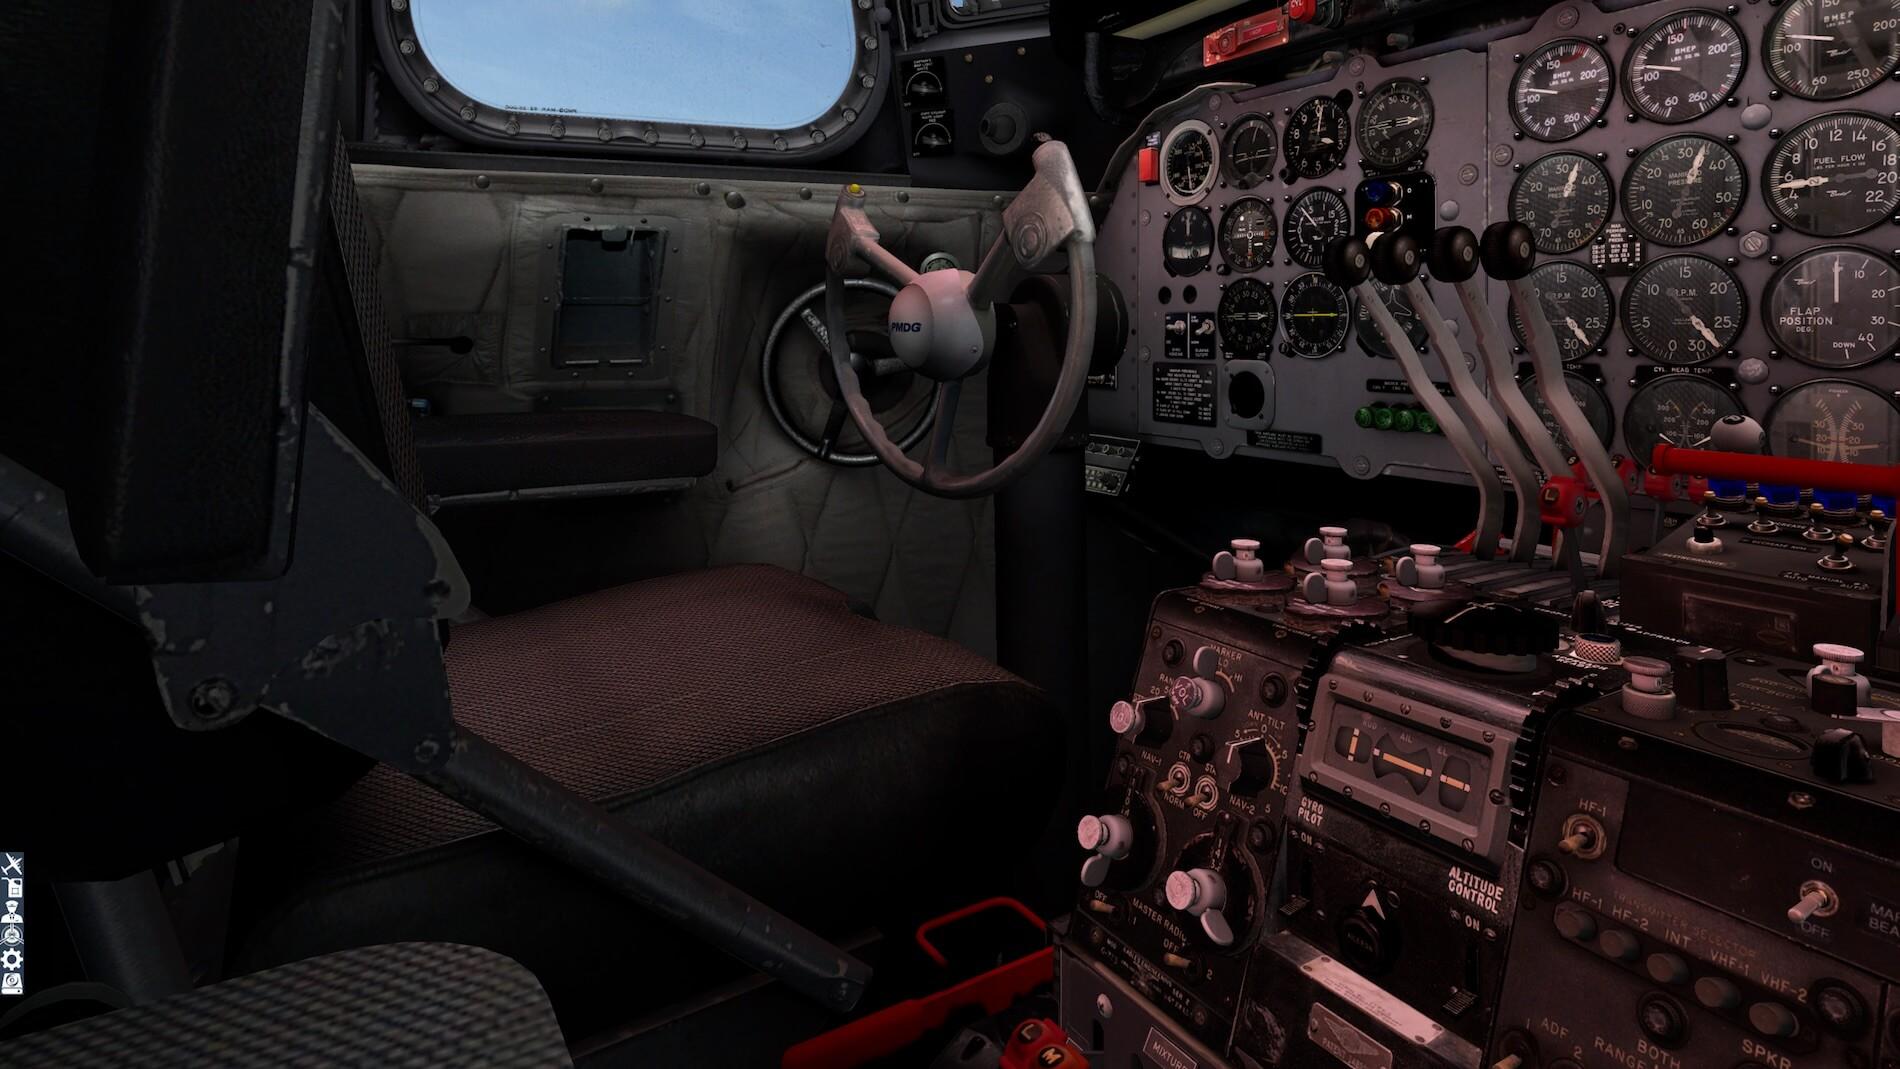 DC-6_29